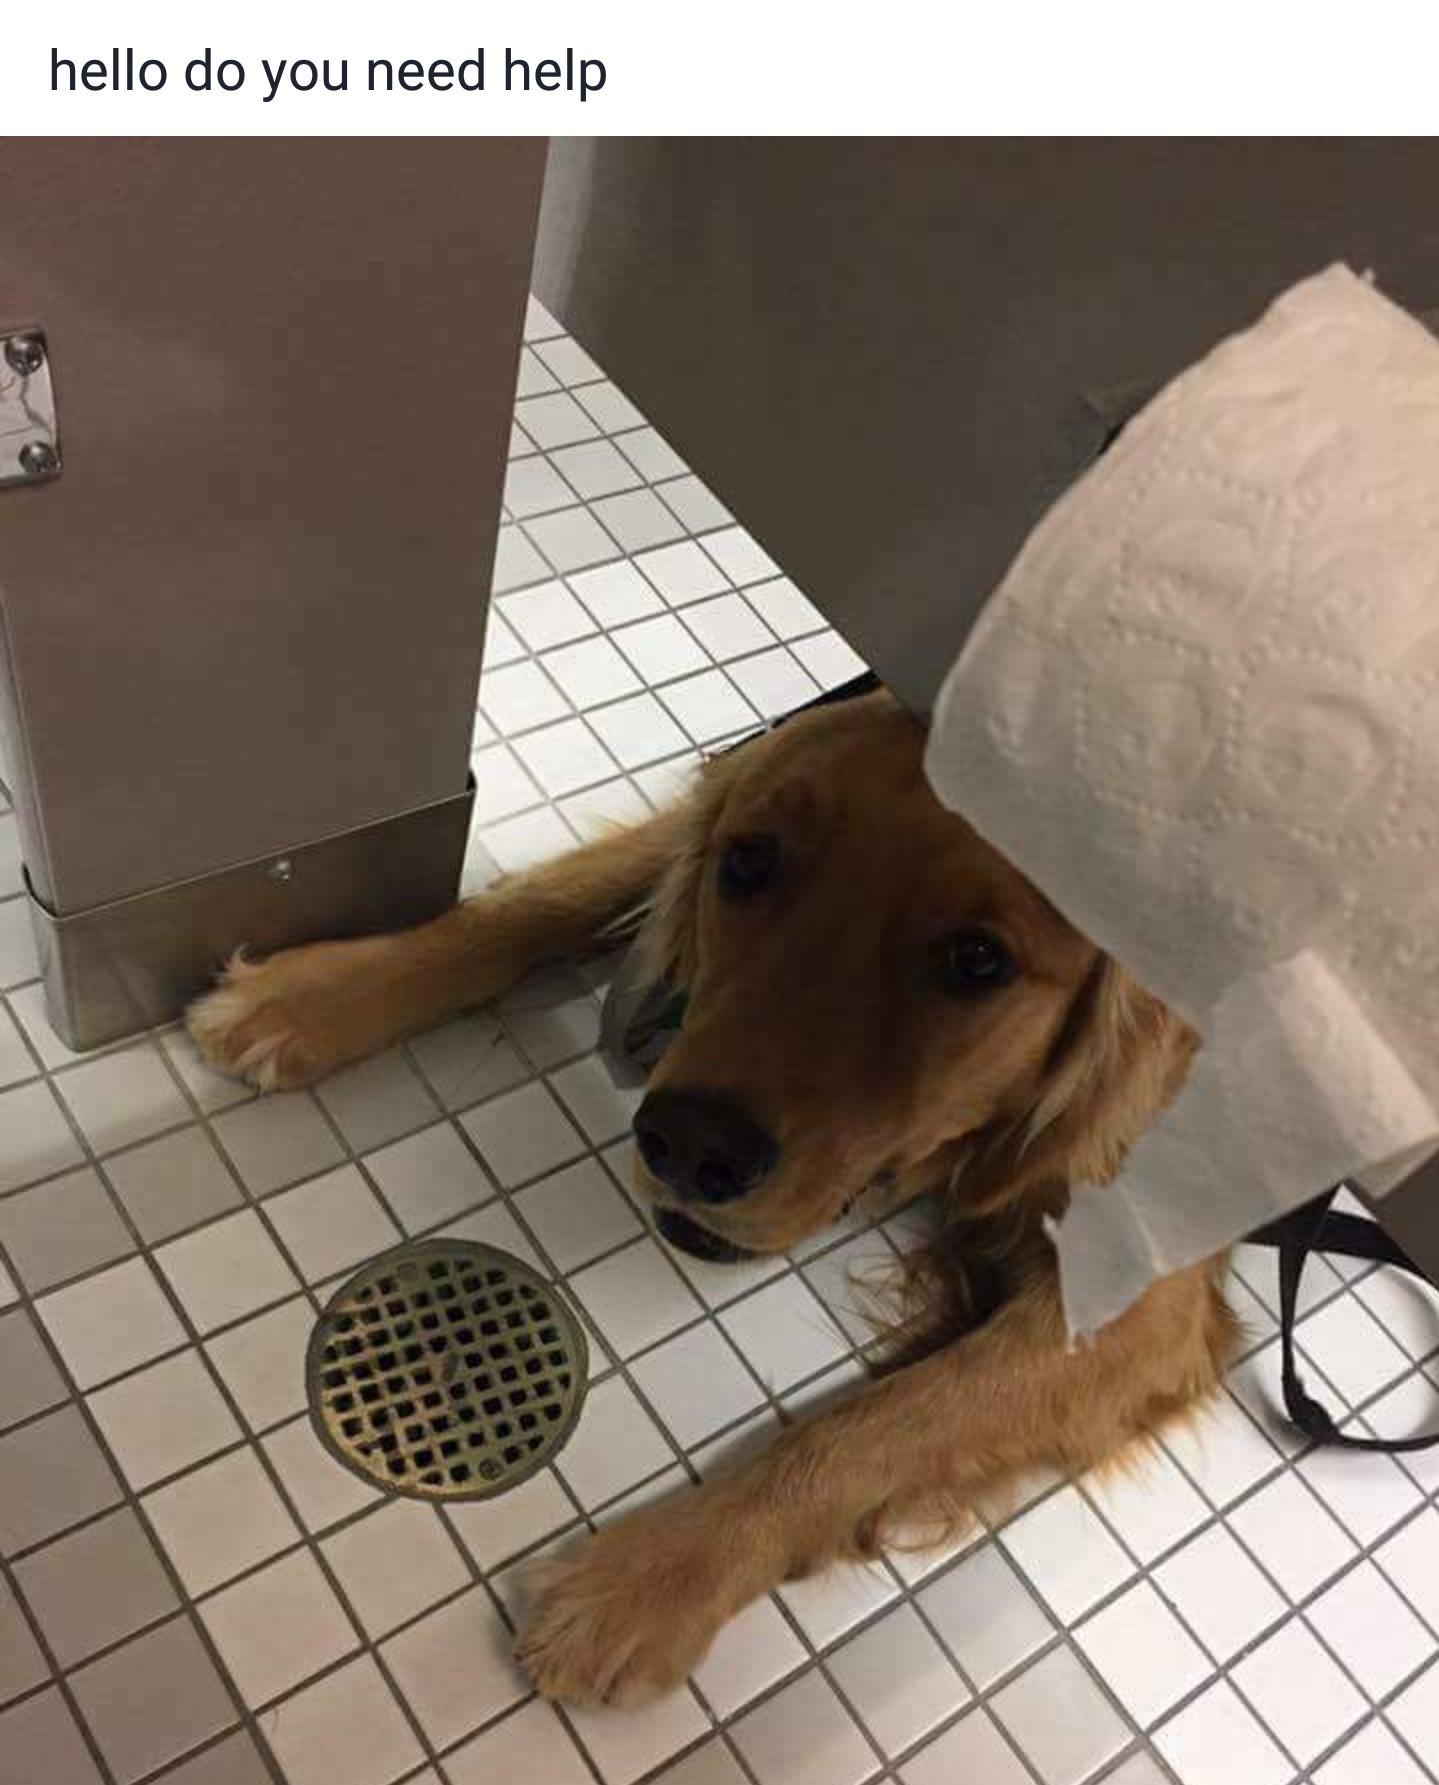 Doggo will help you poop